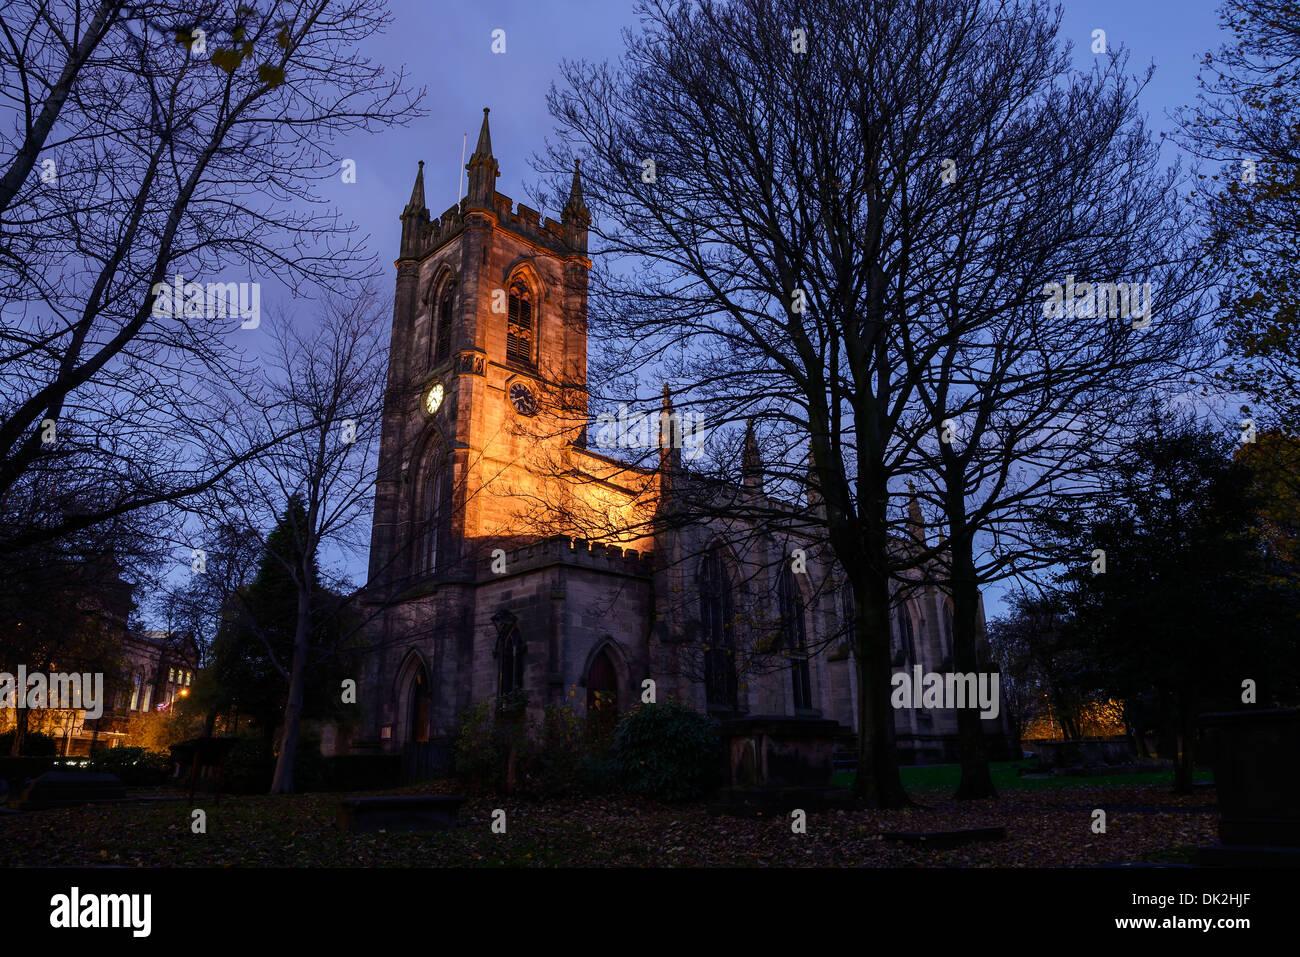 The Minster in Stoke on Trent - Stock Image